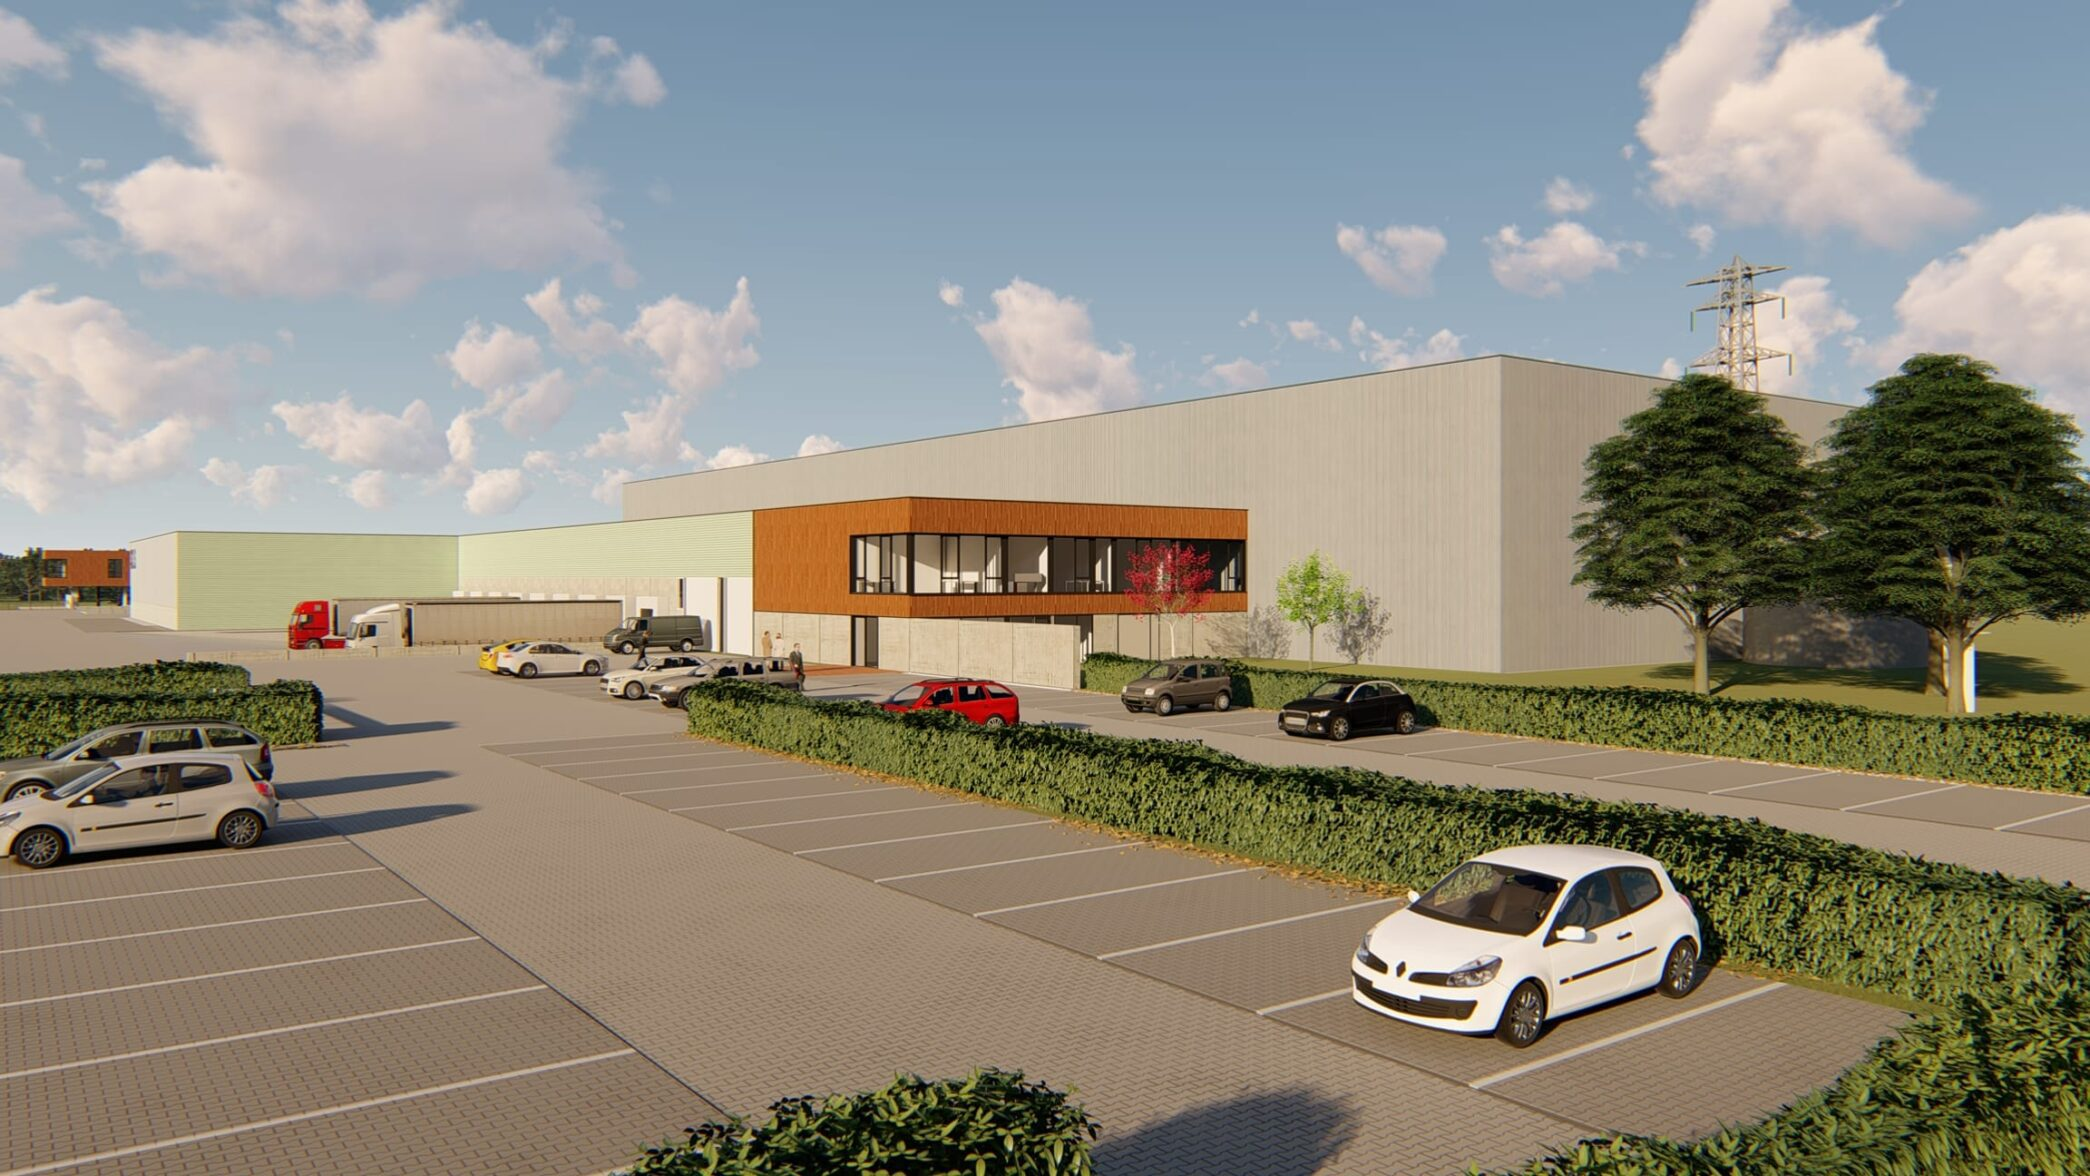 Impressie uitbreiding bedrijfspand Sils Logistics Apeldoorn